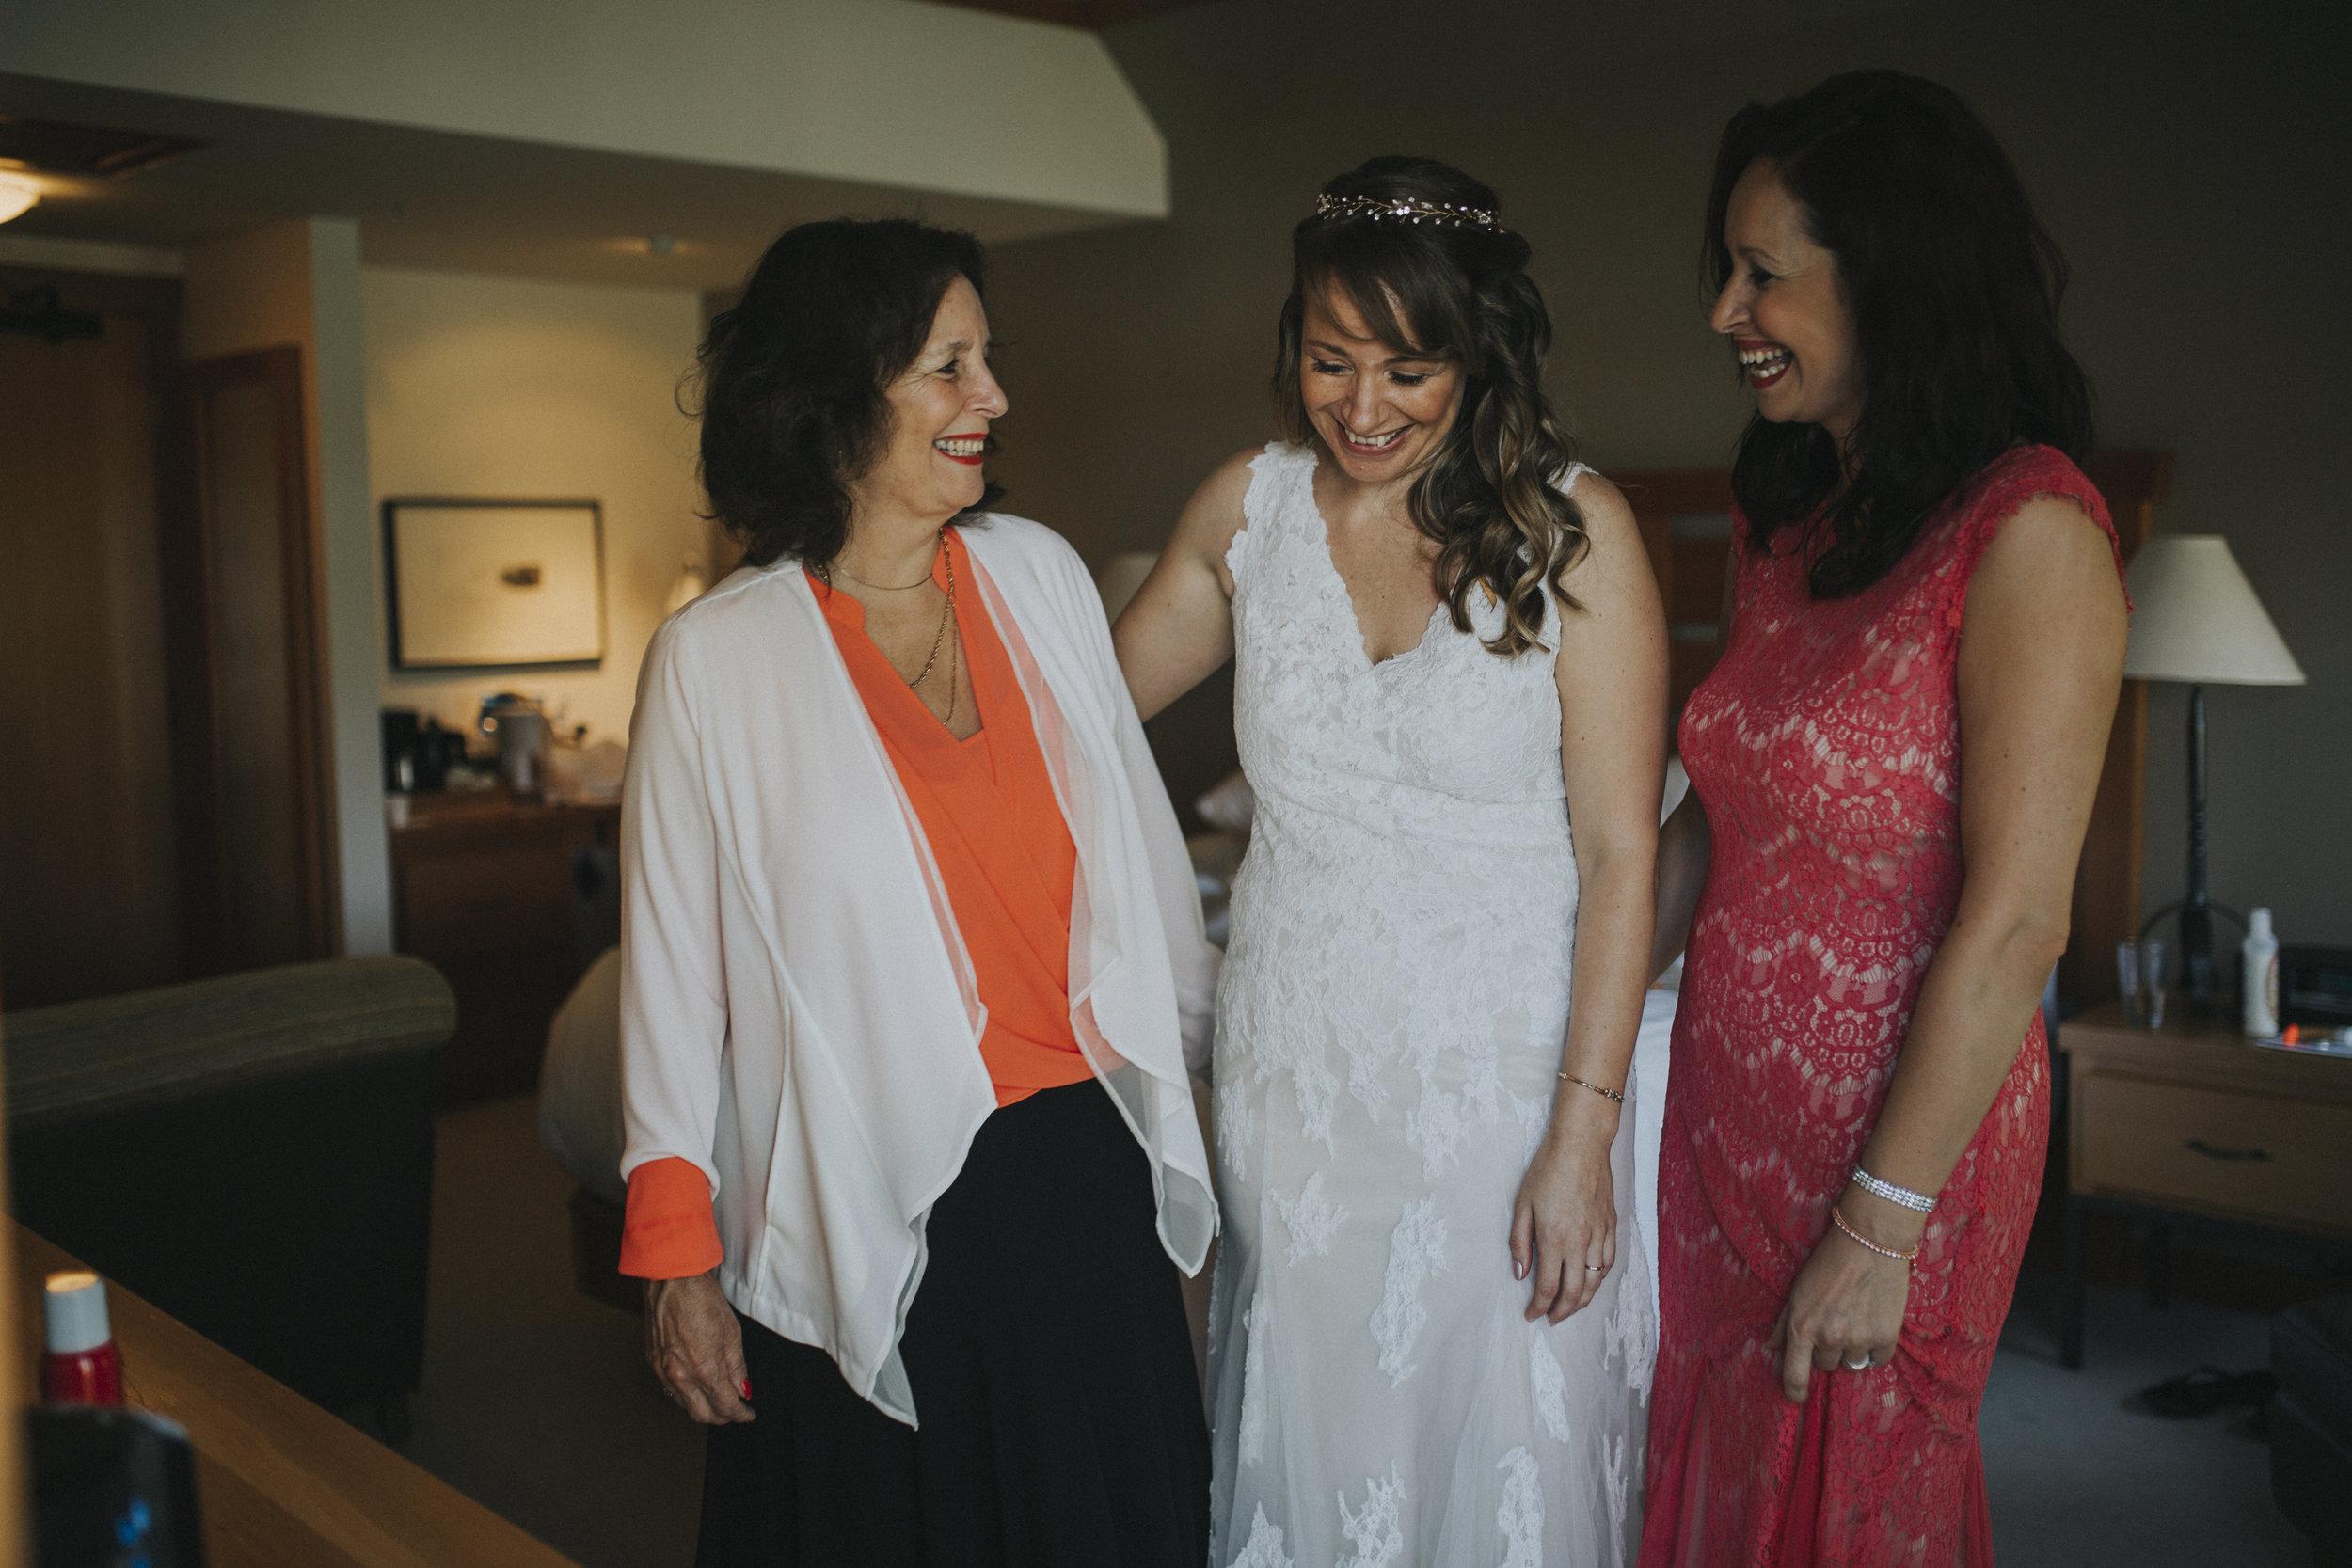 mother daughter bride get ready wickaninnish inn tofino wedding